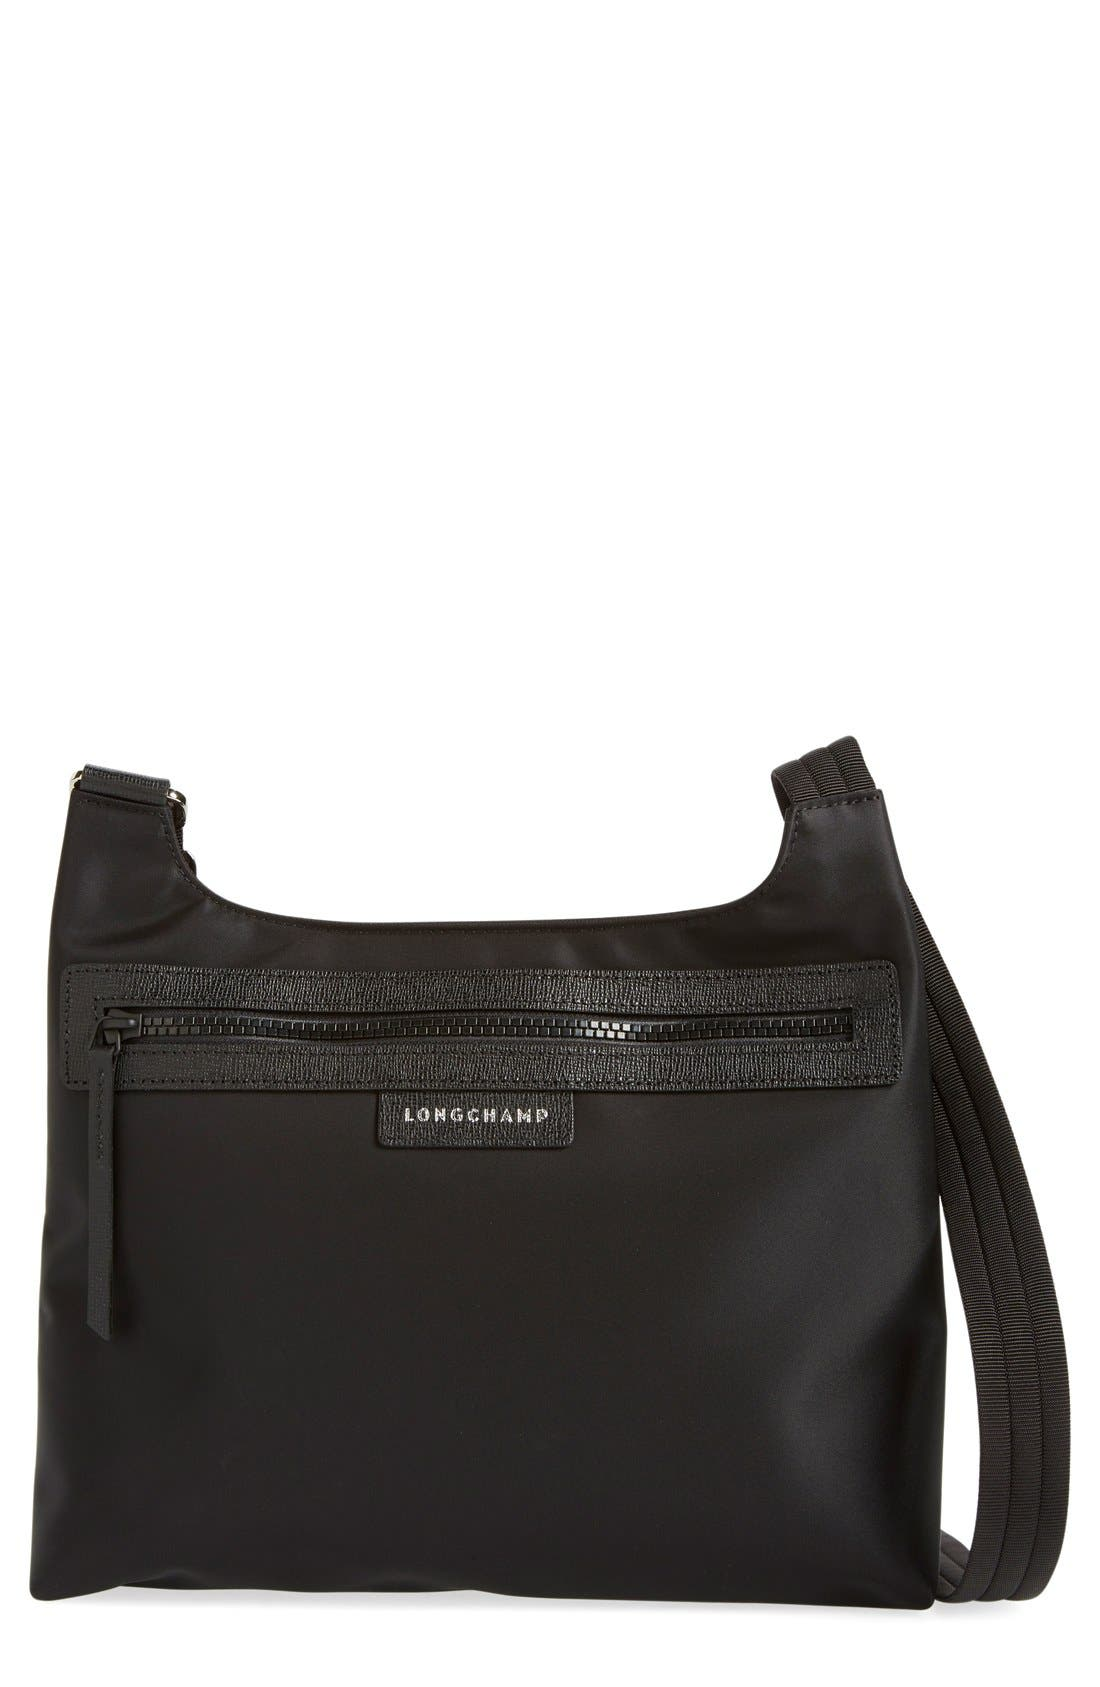 LONGCHAMP Le Pliage Neo Nylon Crossbody Bag